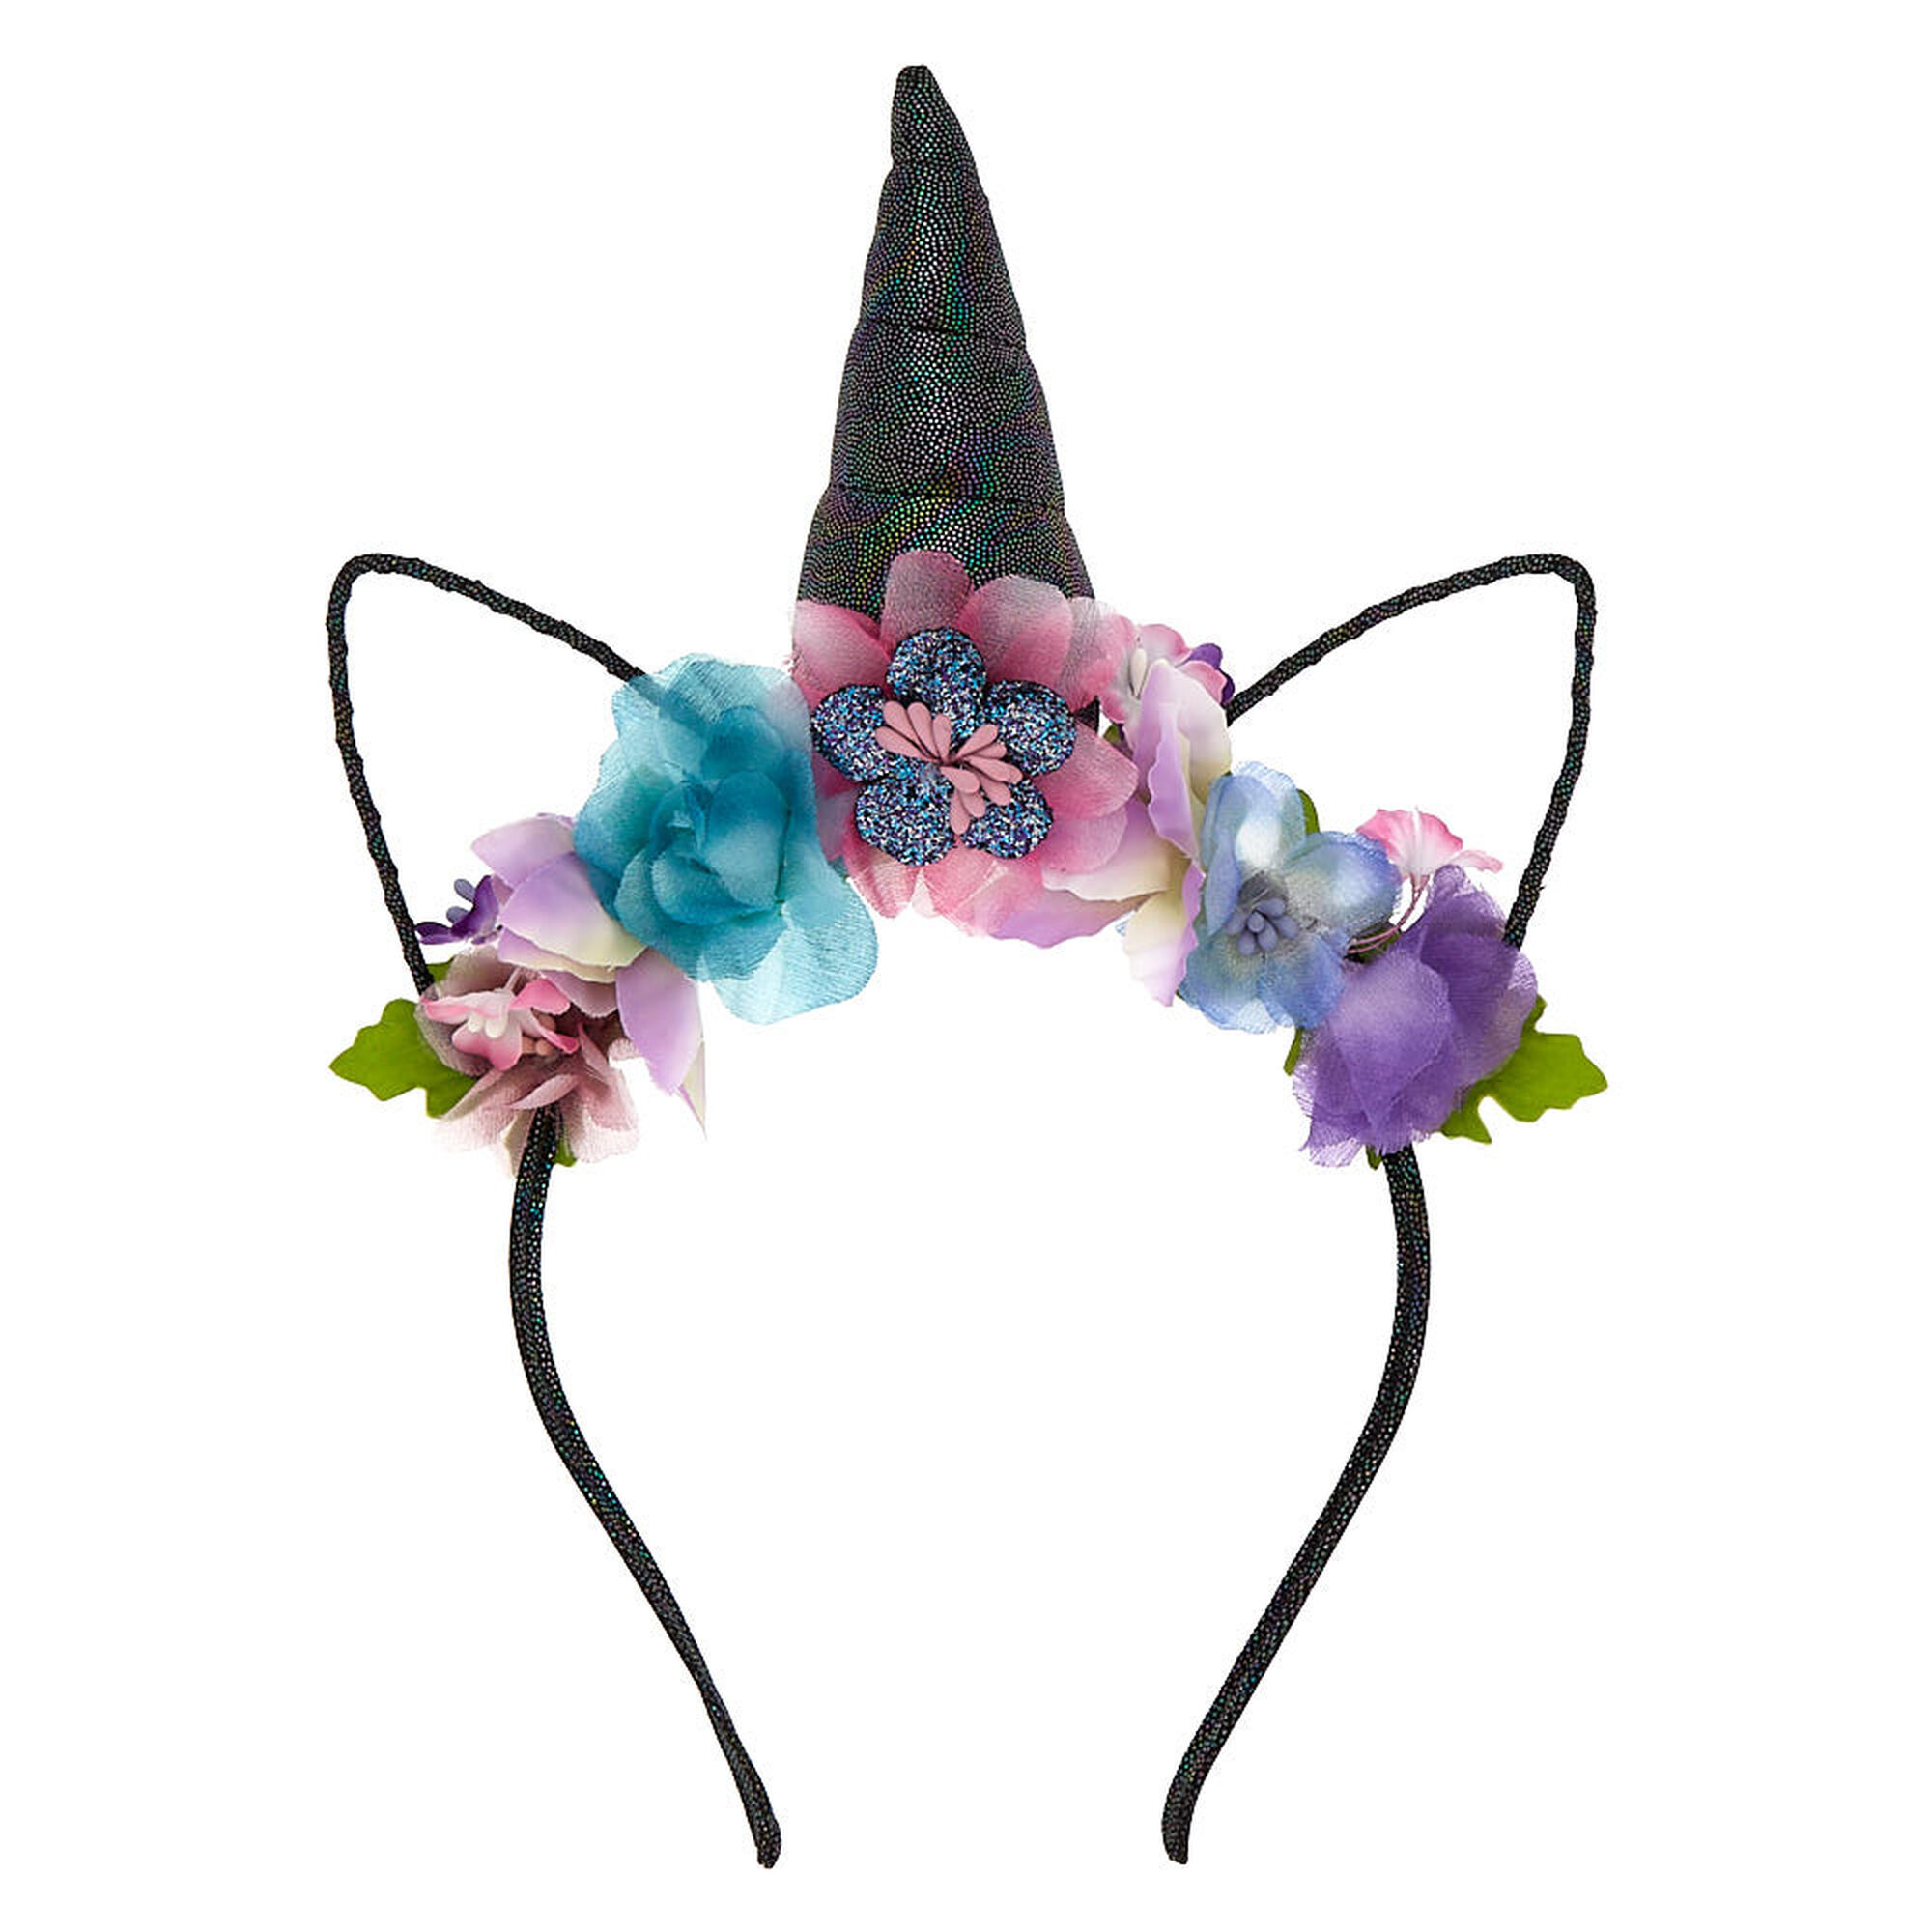 Dark unicorn flower crown headband purple claires us dark unicorn flower crown headband purple izmirmasajfo